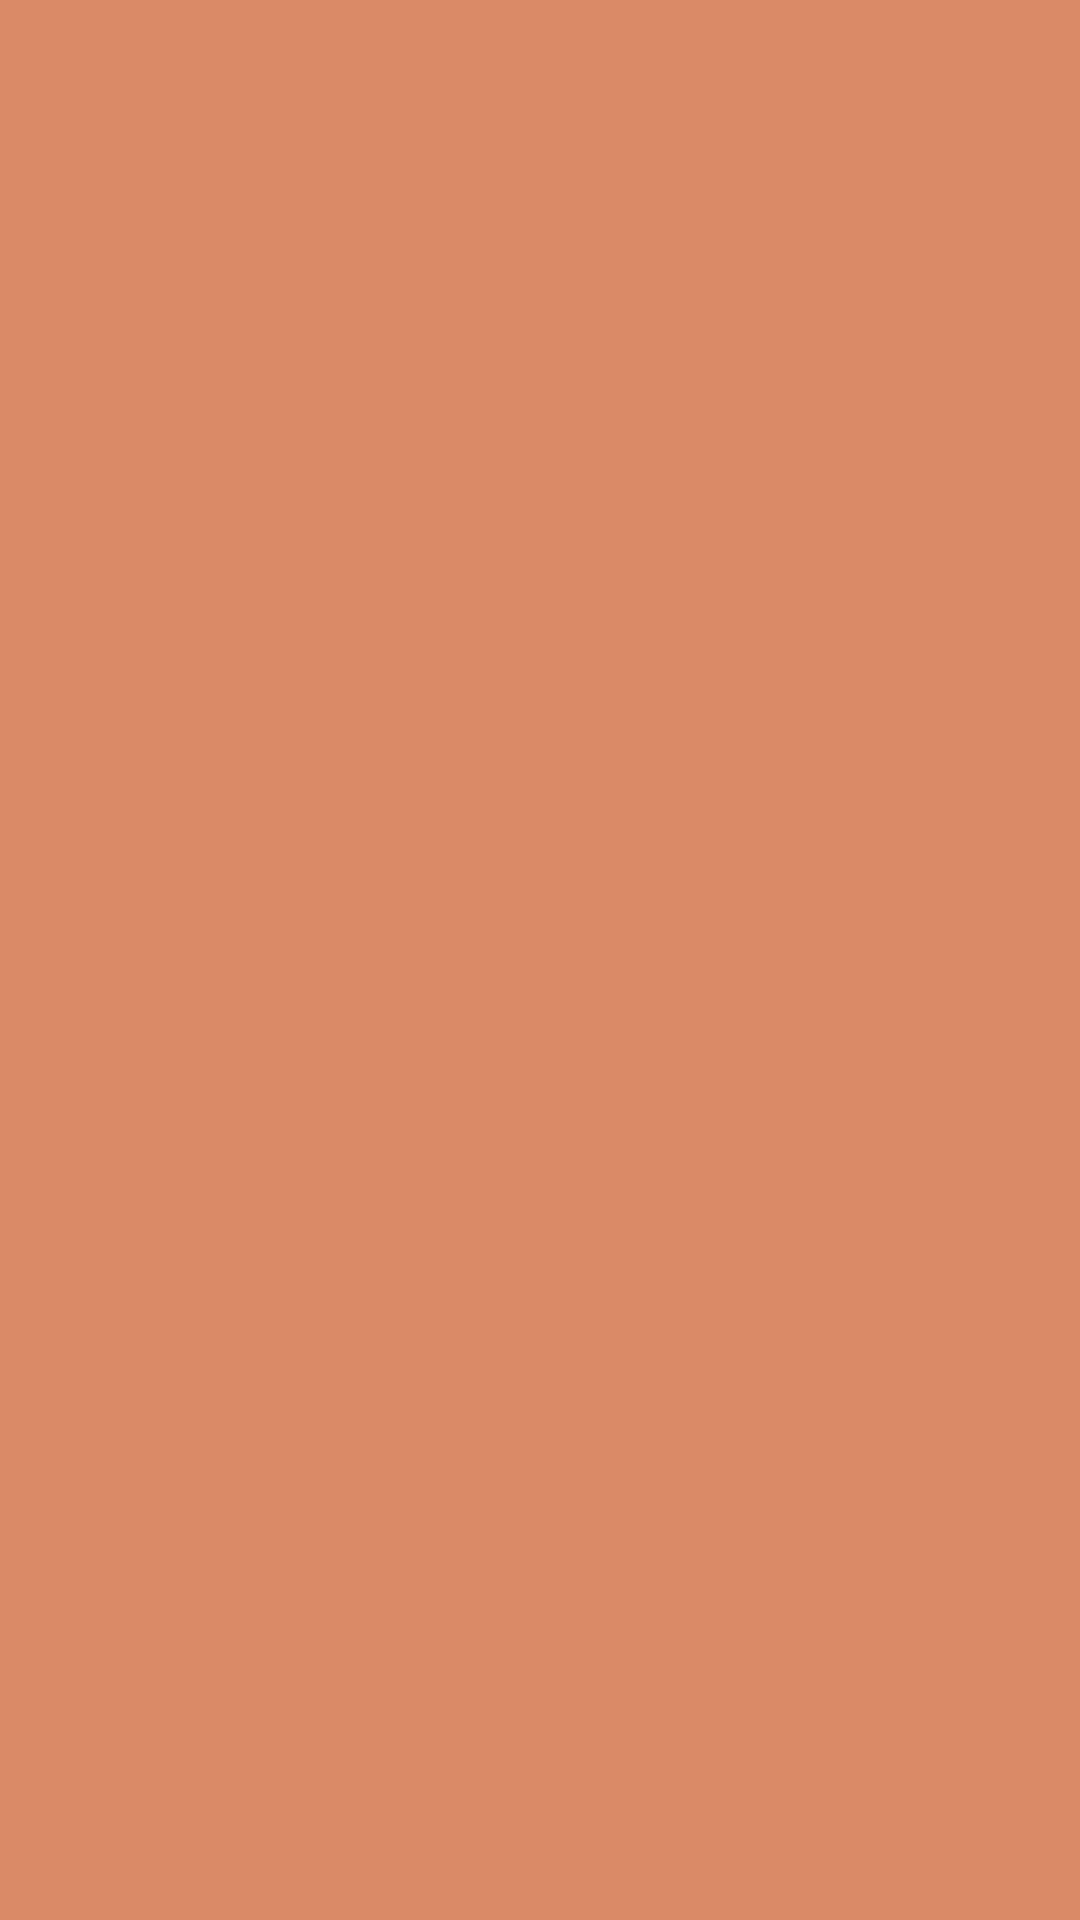 1080x1920 Pale Copper Solid Color Background